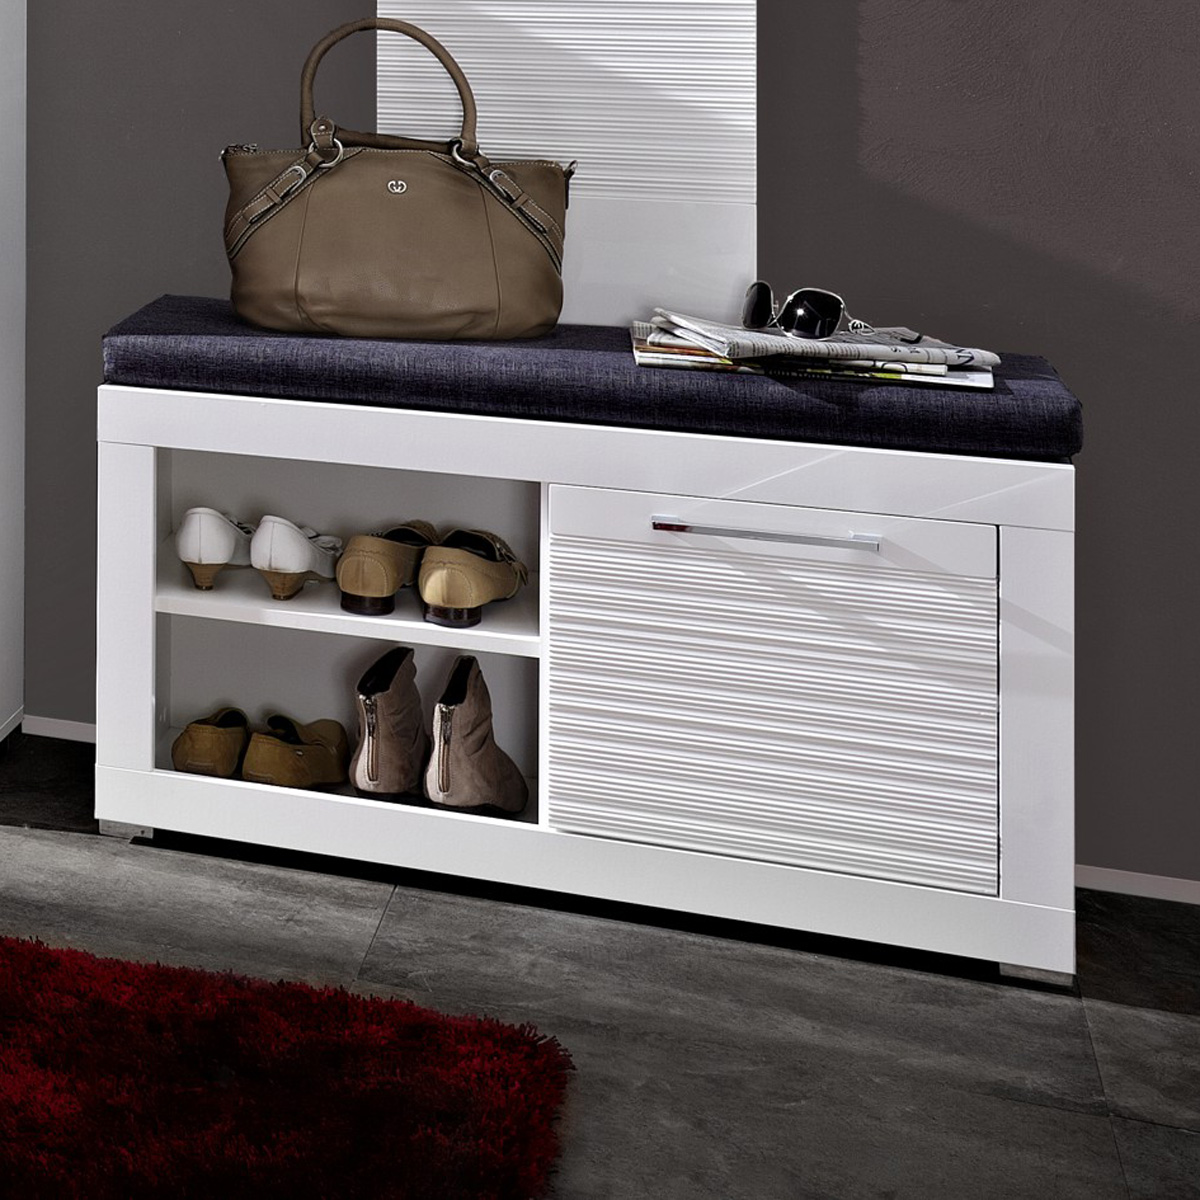 bank file sitzbank inkl sitzkissen wei hochglanz geriffelt neu ebay. Black Bedroom Furniture Sets. Home Design Ideas